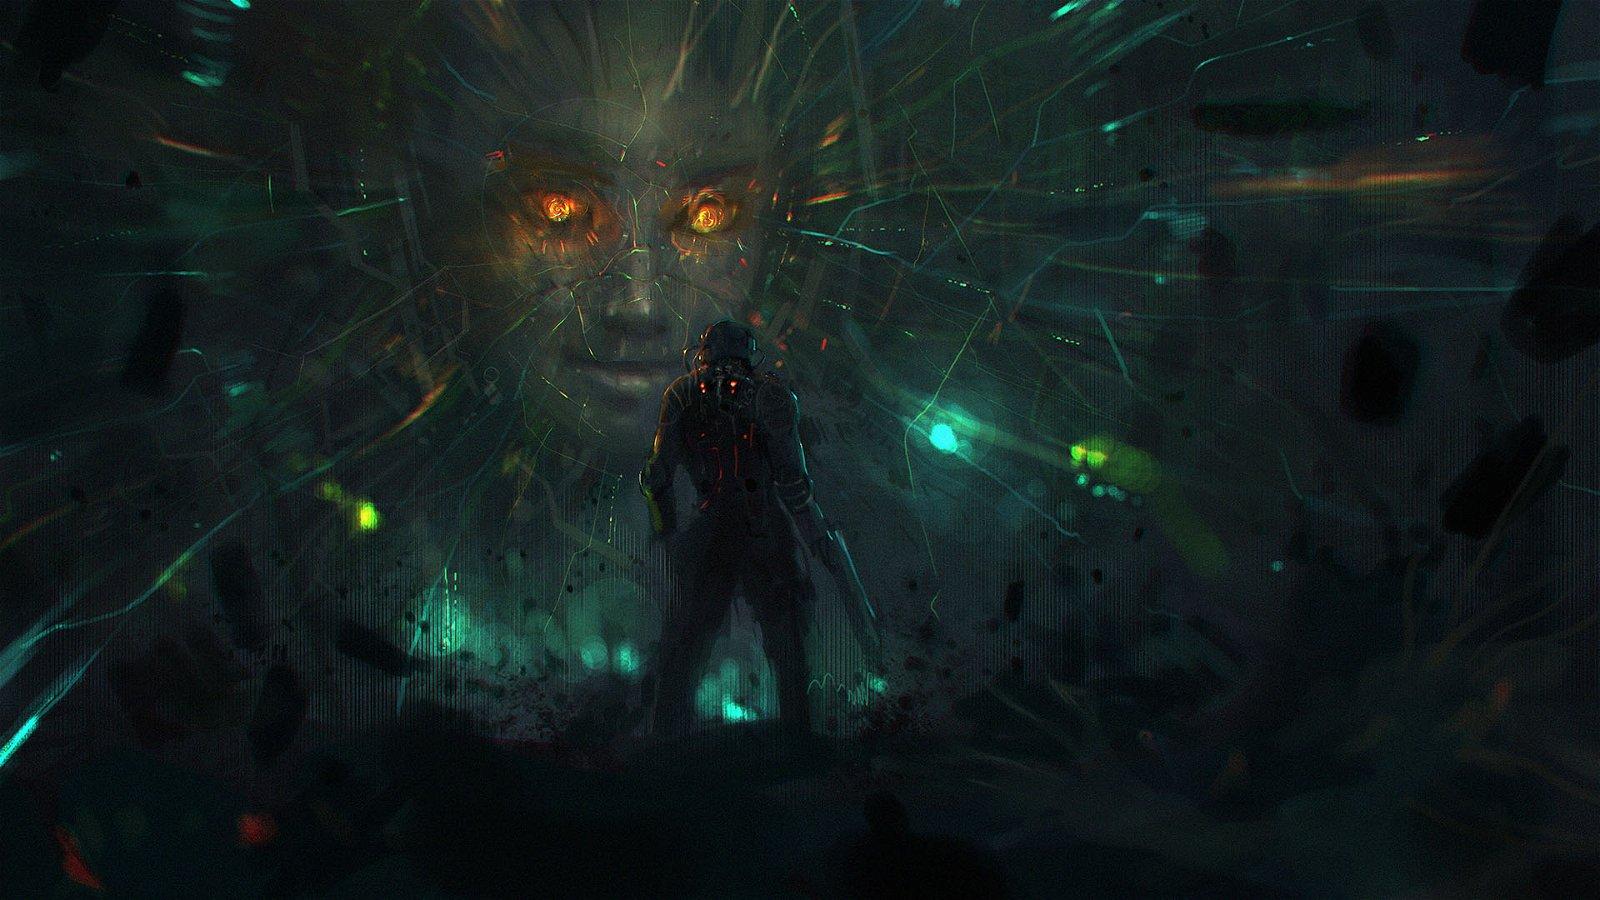 System Shock Reboot Kickstarter Funded; Releasing in 2017